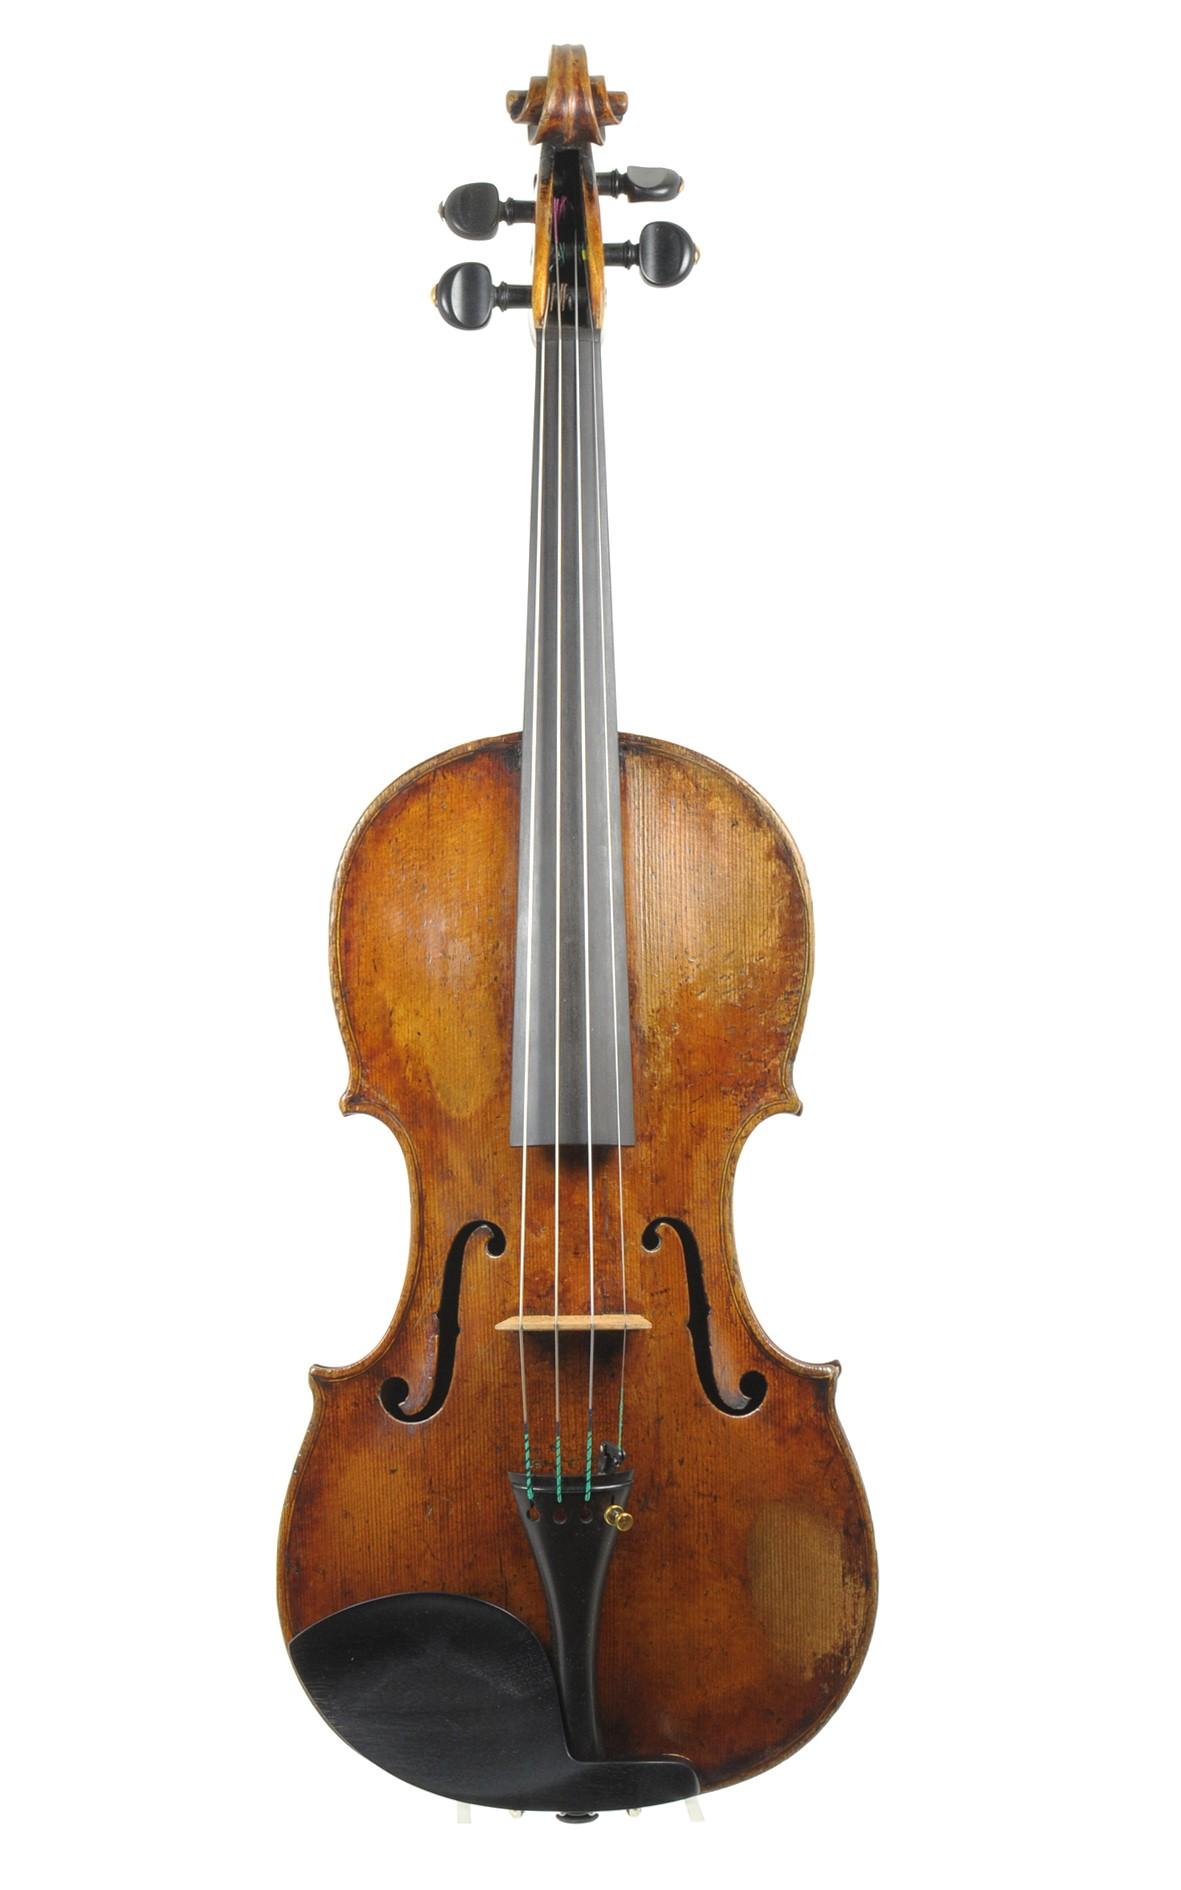 Fine violin of the Mittenwald violin making tradition